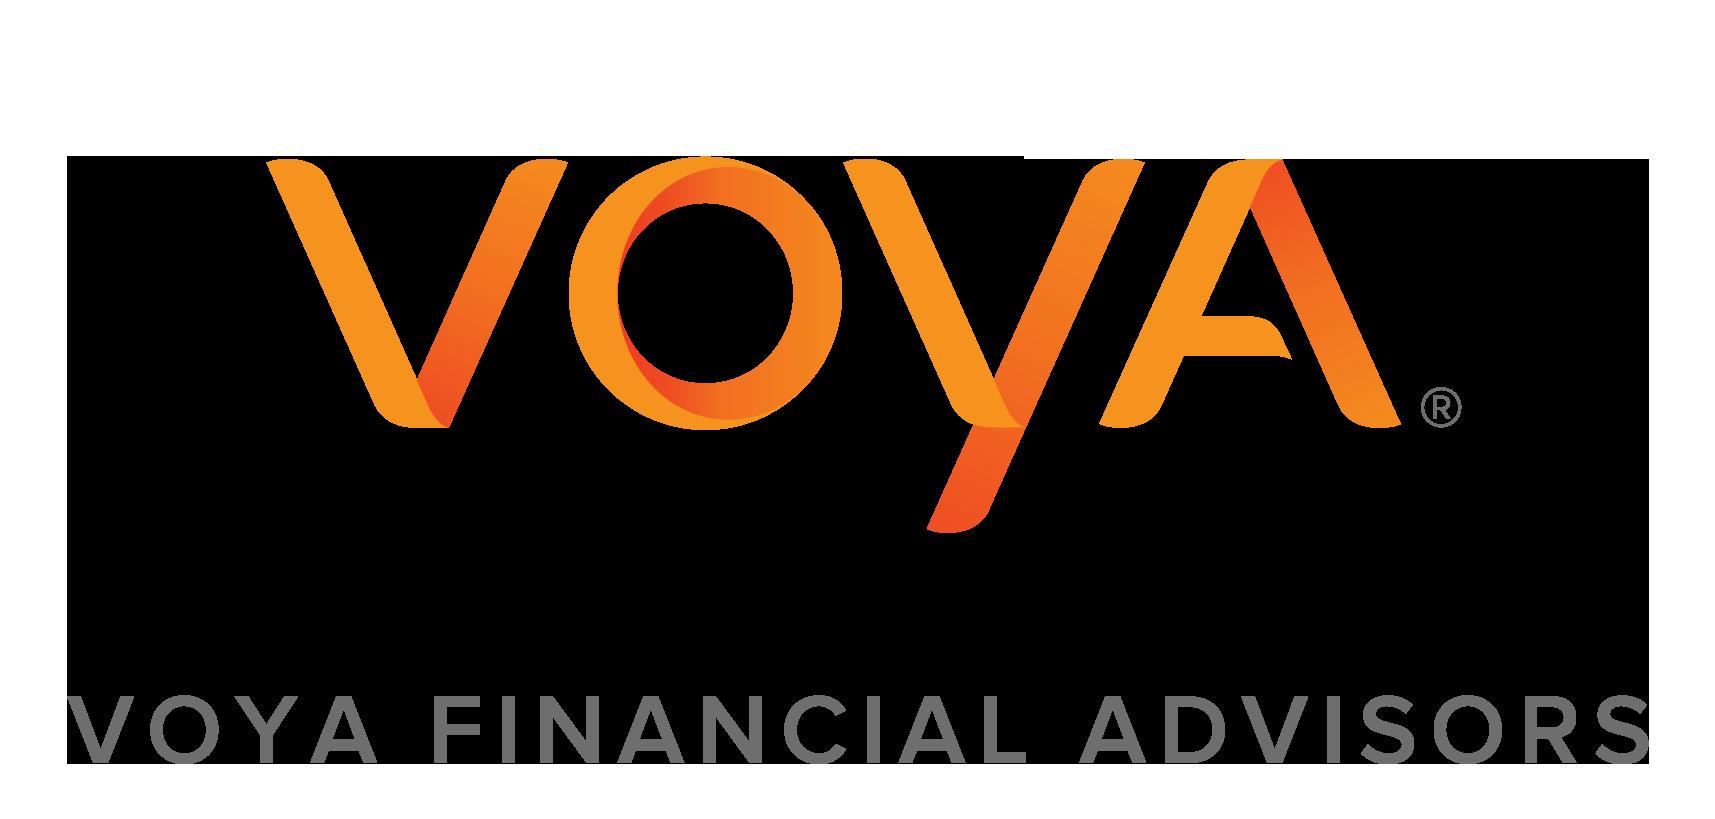 Voya Logo Boca Raton, FL Feller Financial Services